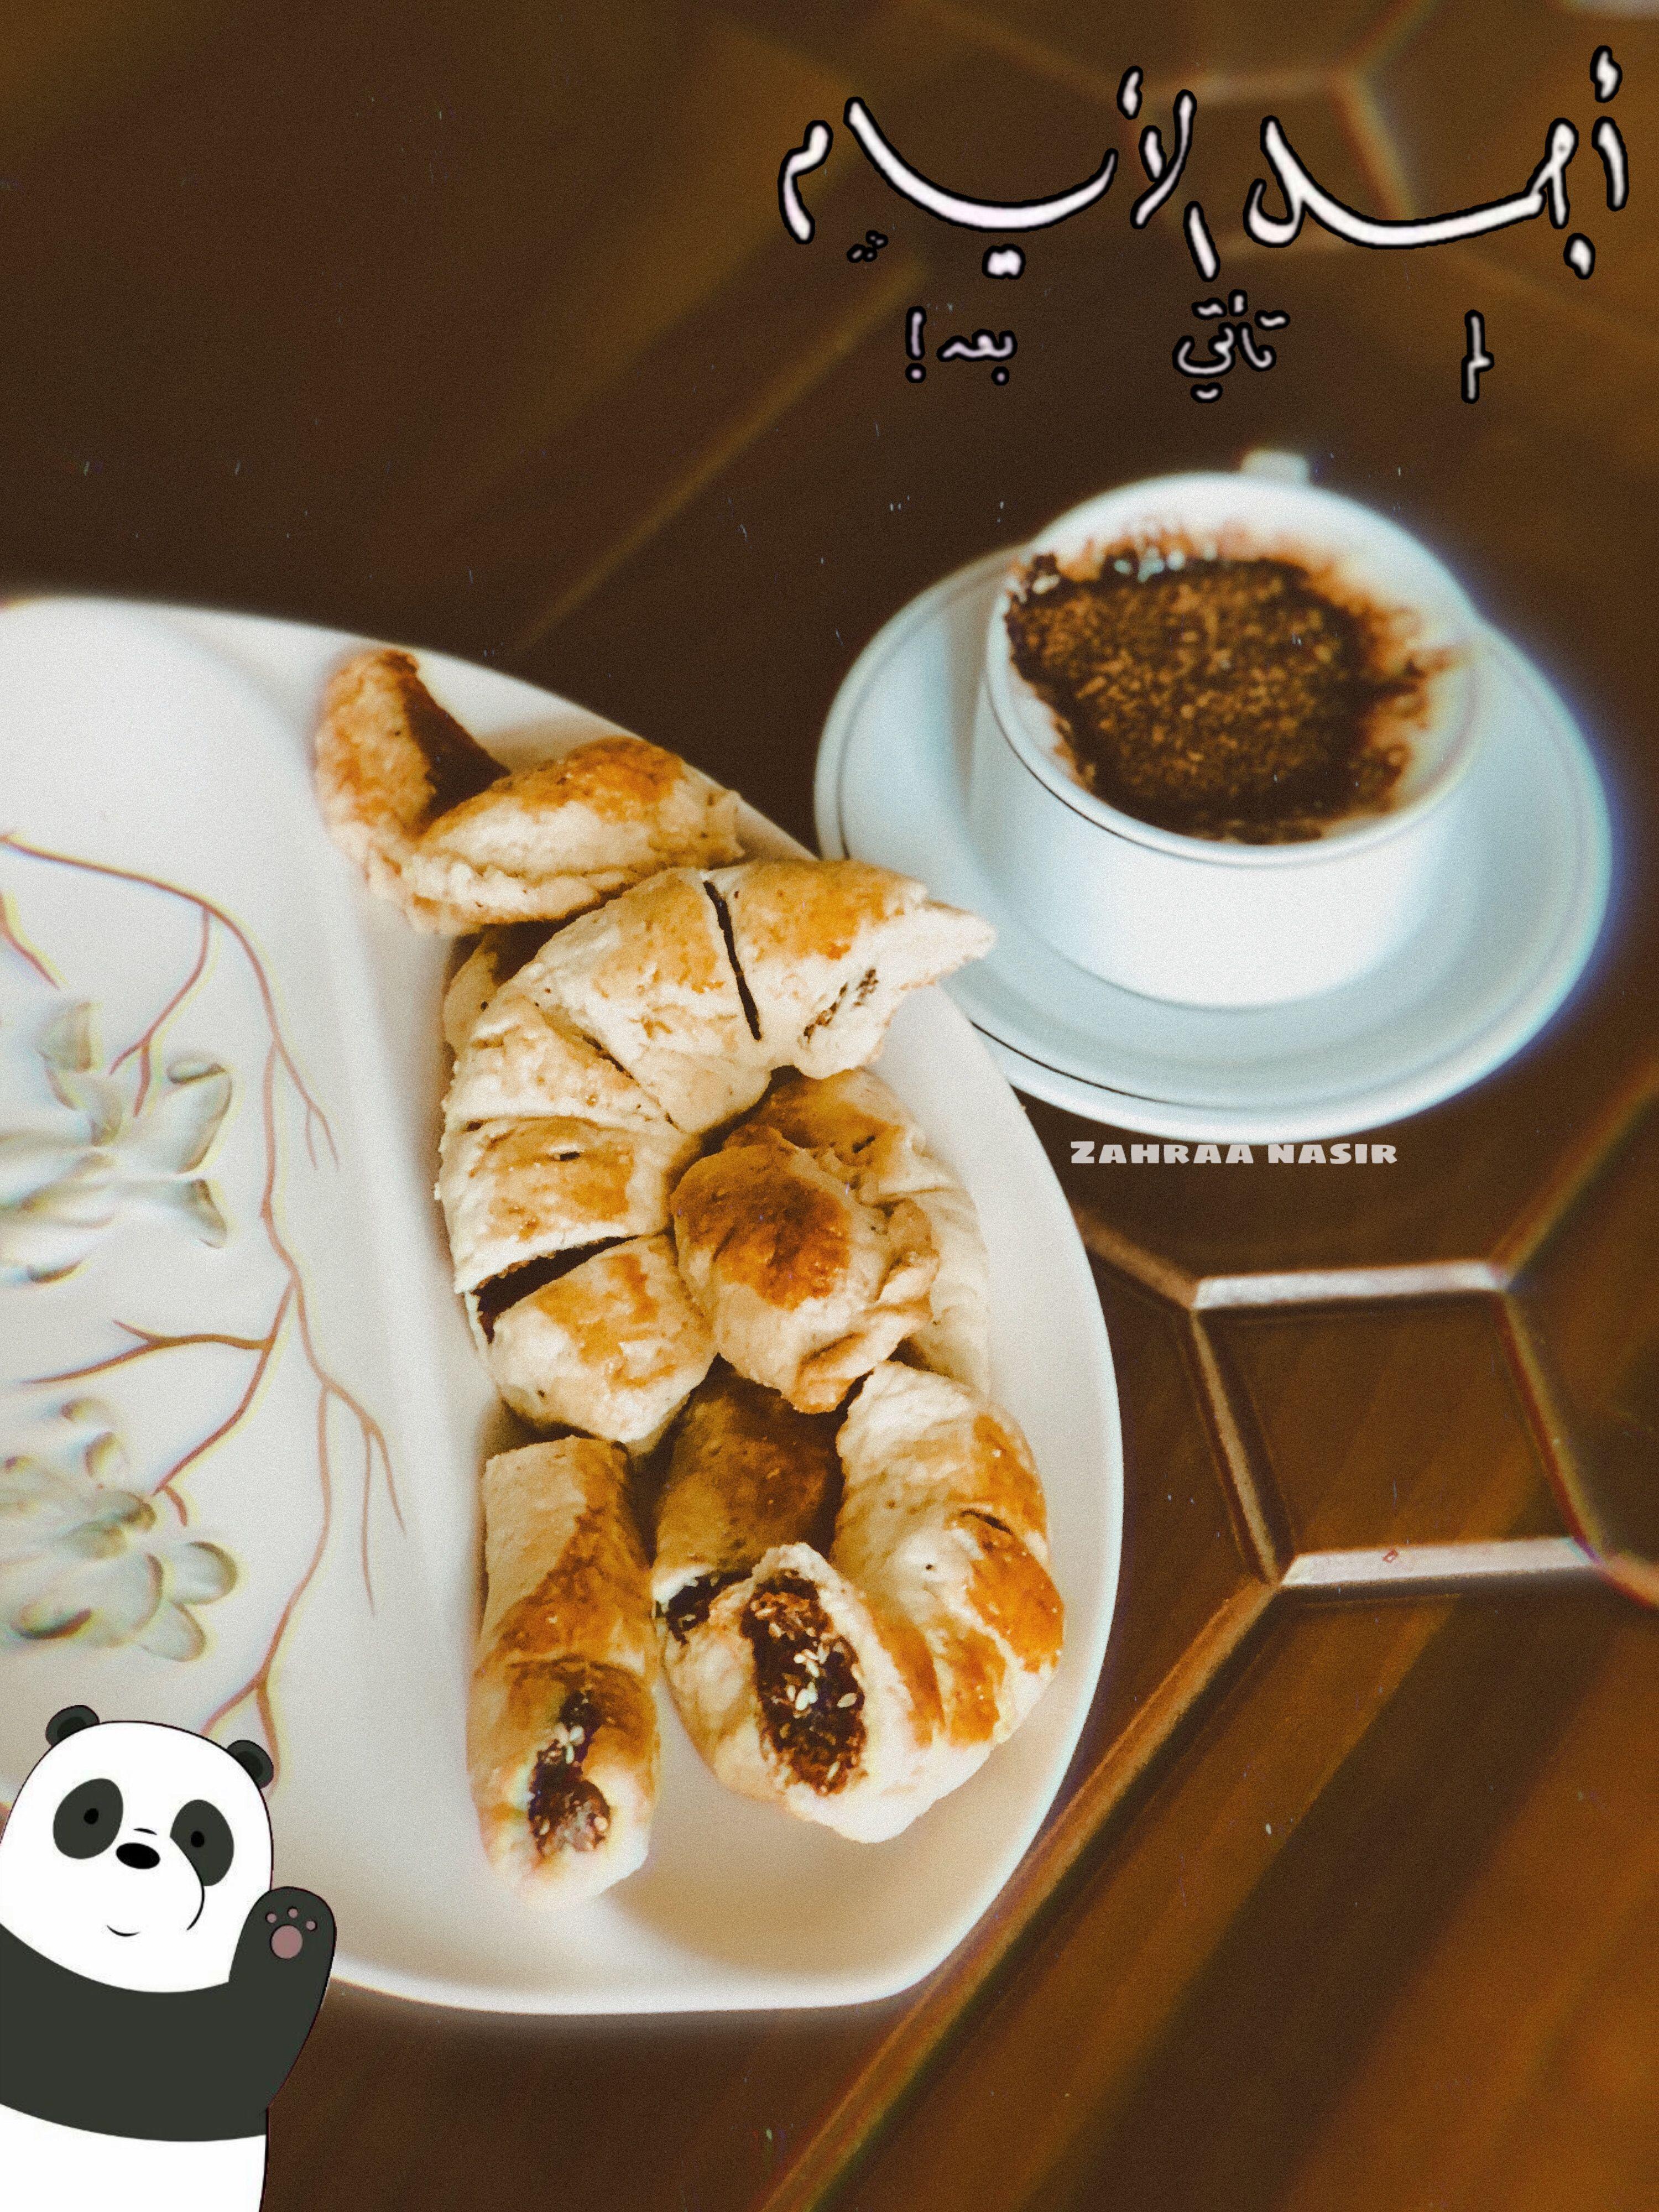 Pin By Sahar Alshami On Oshsi In 2021 Food Instagram Story Ideas Breakfast